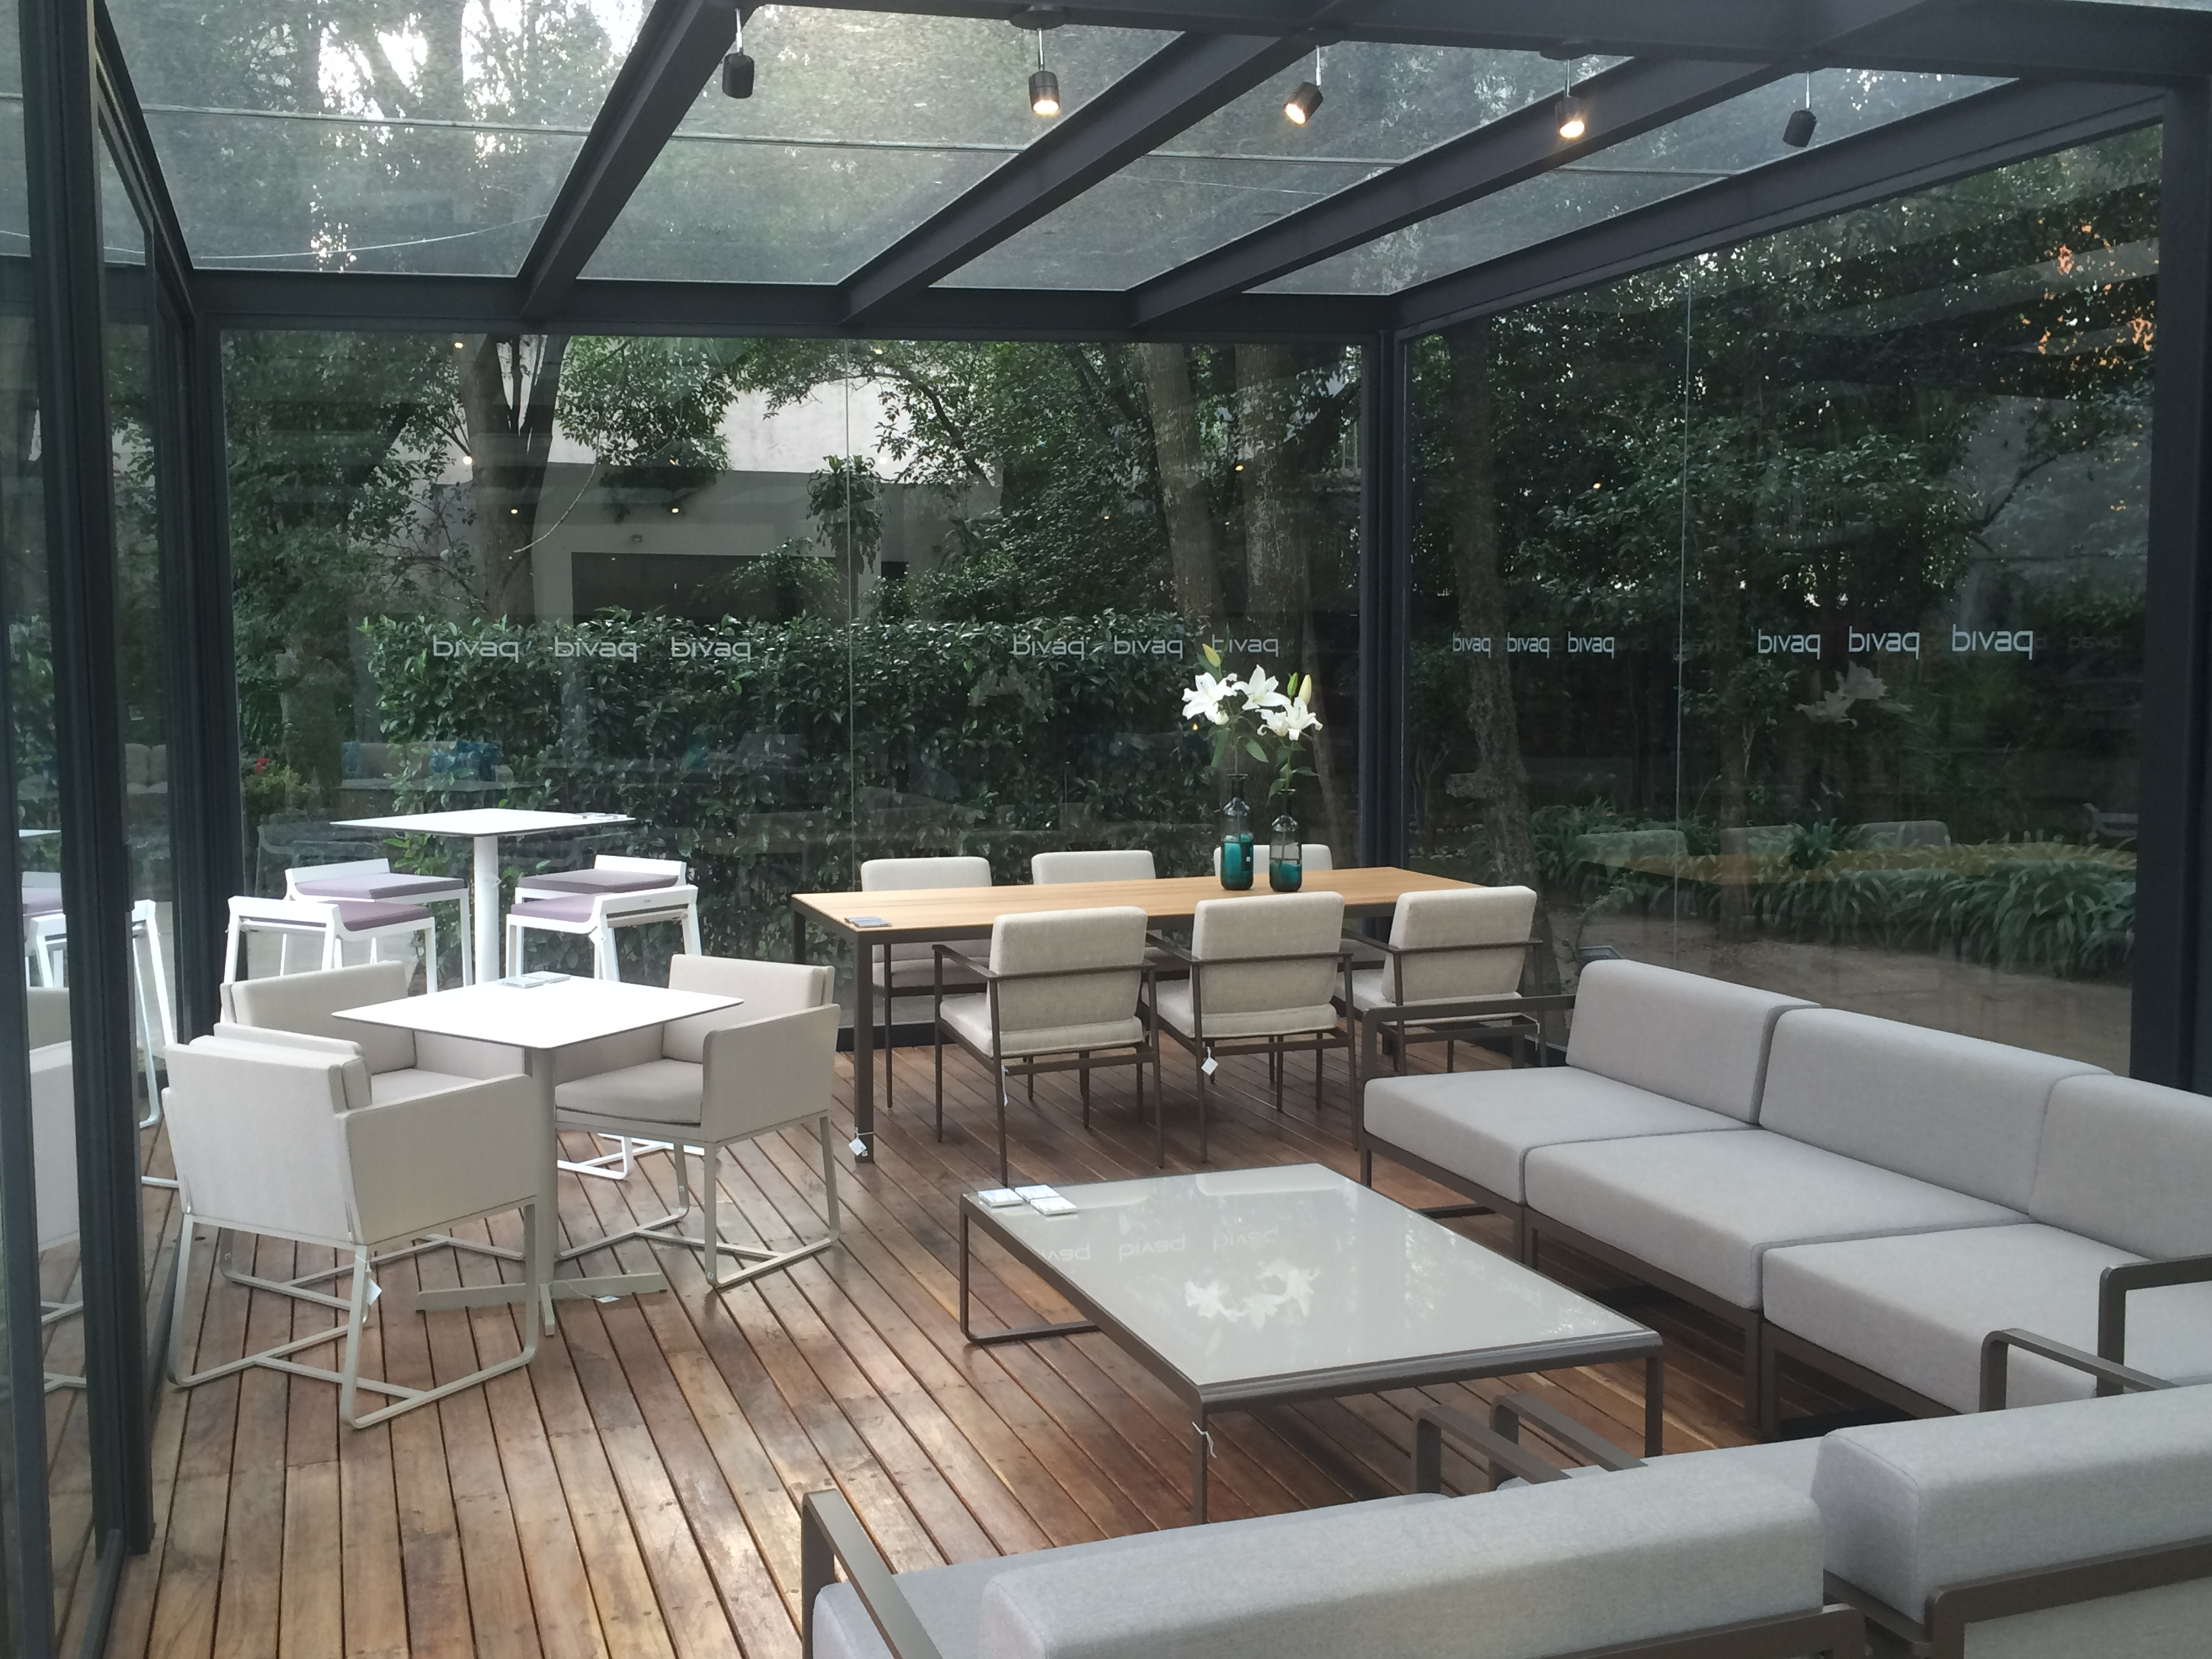 outdoor furniture showroom Bivaq